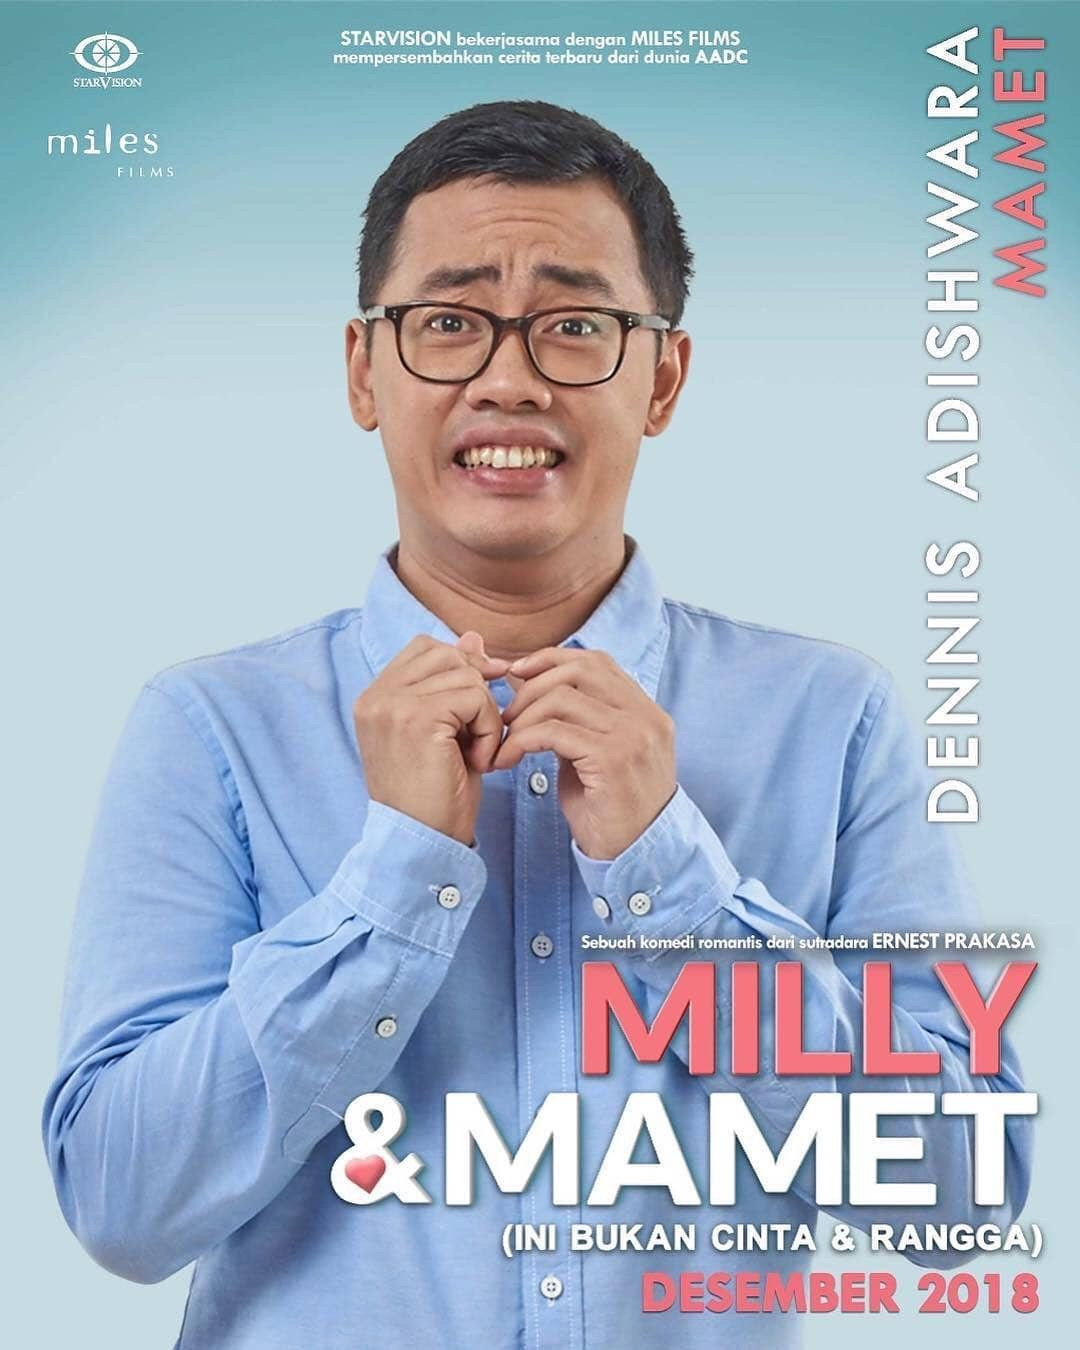 Nonton Film Milly Dan Mamet Full Movie : nonton, milly, mamet, movie, Milly, Mamet, Movies,, Movie,